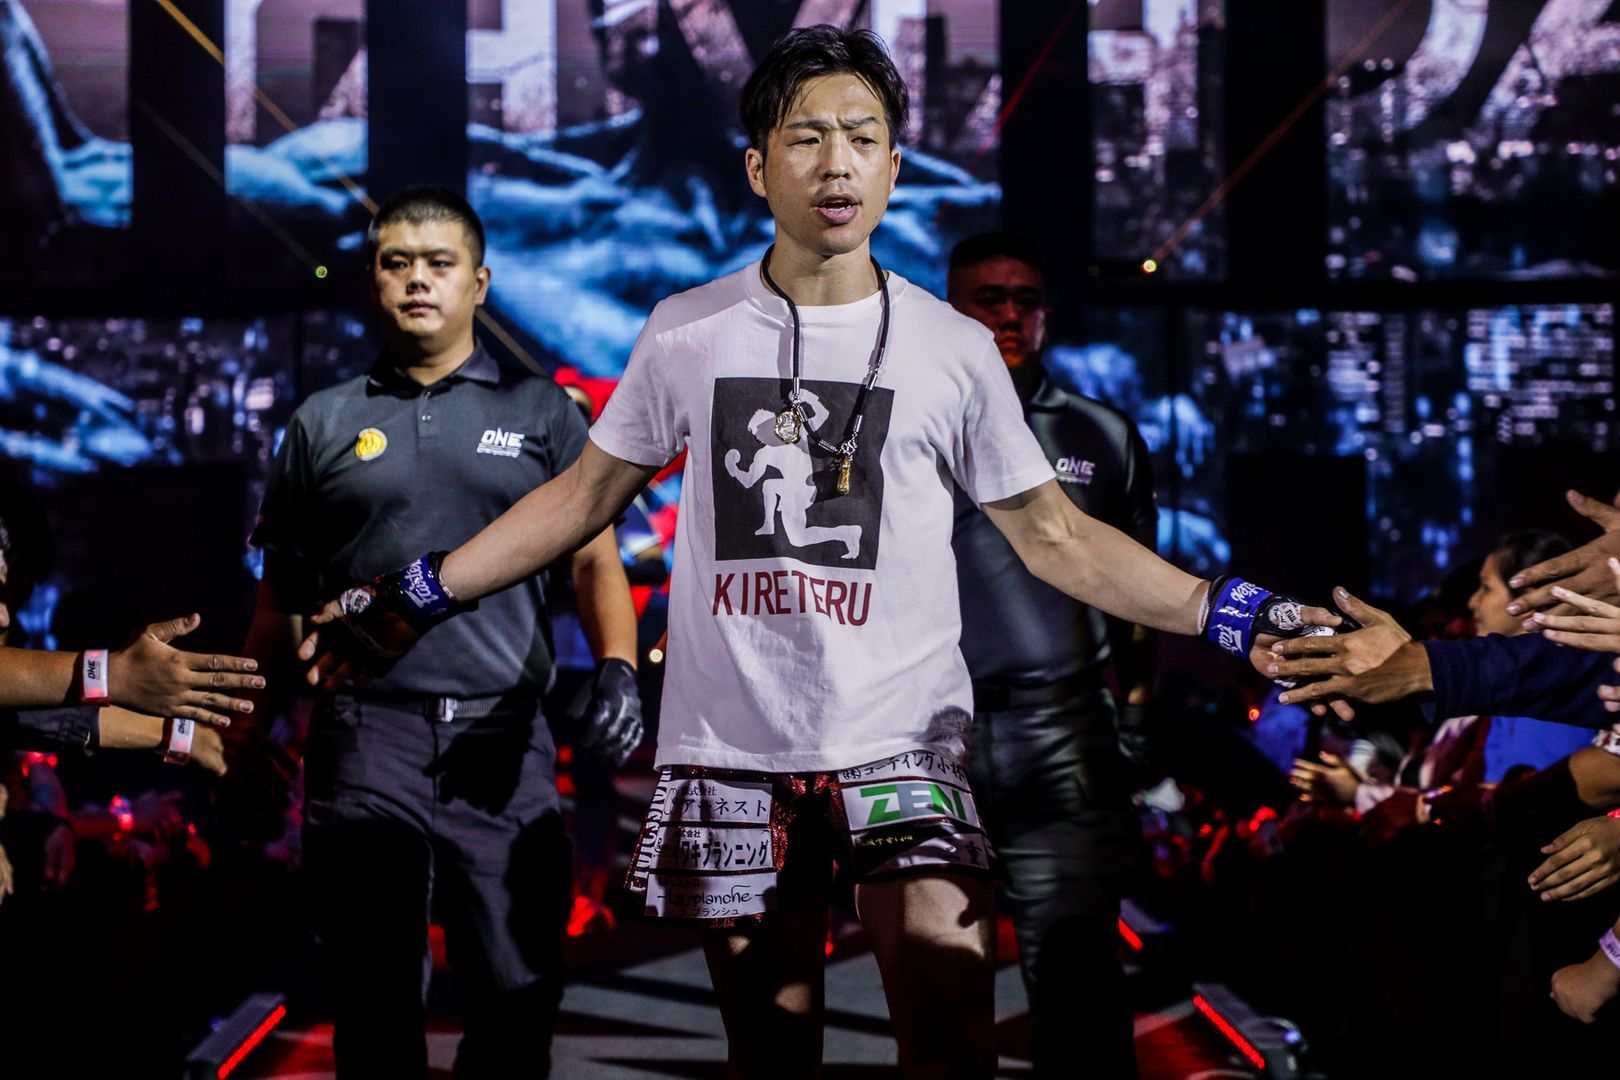 Japanese Muay Thai Fighter Kenta Yamada makes his entrance